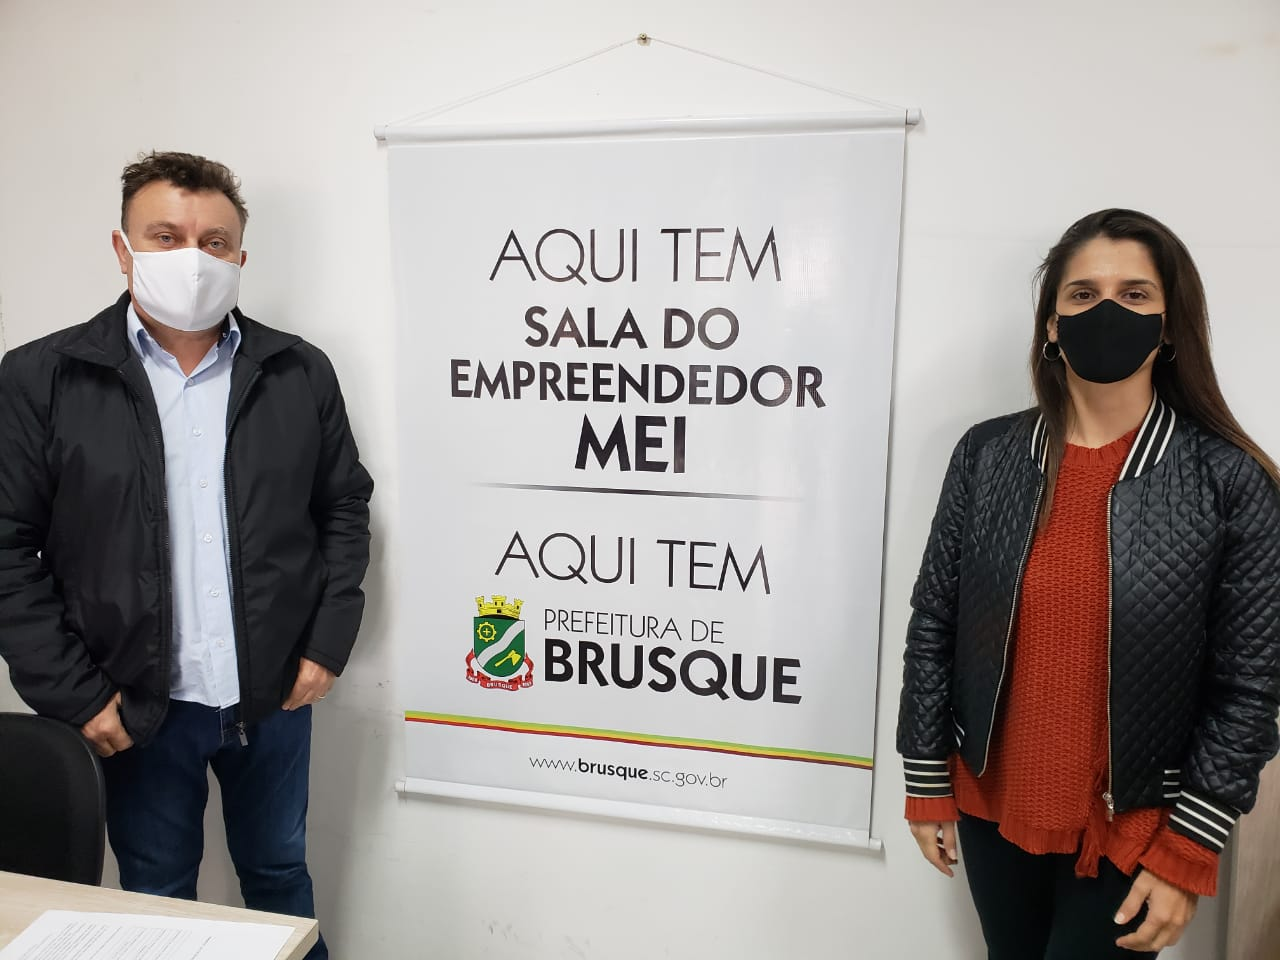 Prefeitura de Brusque e Sebrae promovem consultoria gratuita para MEI's, Micro Empresas e Empresas de Pequeno Porte